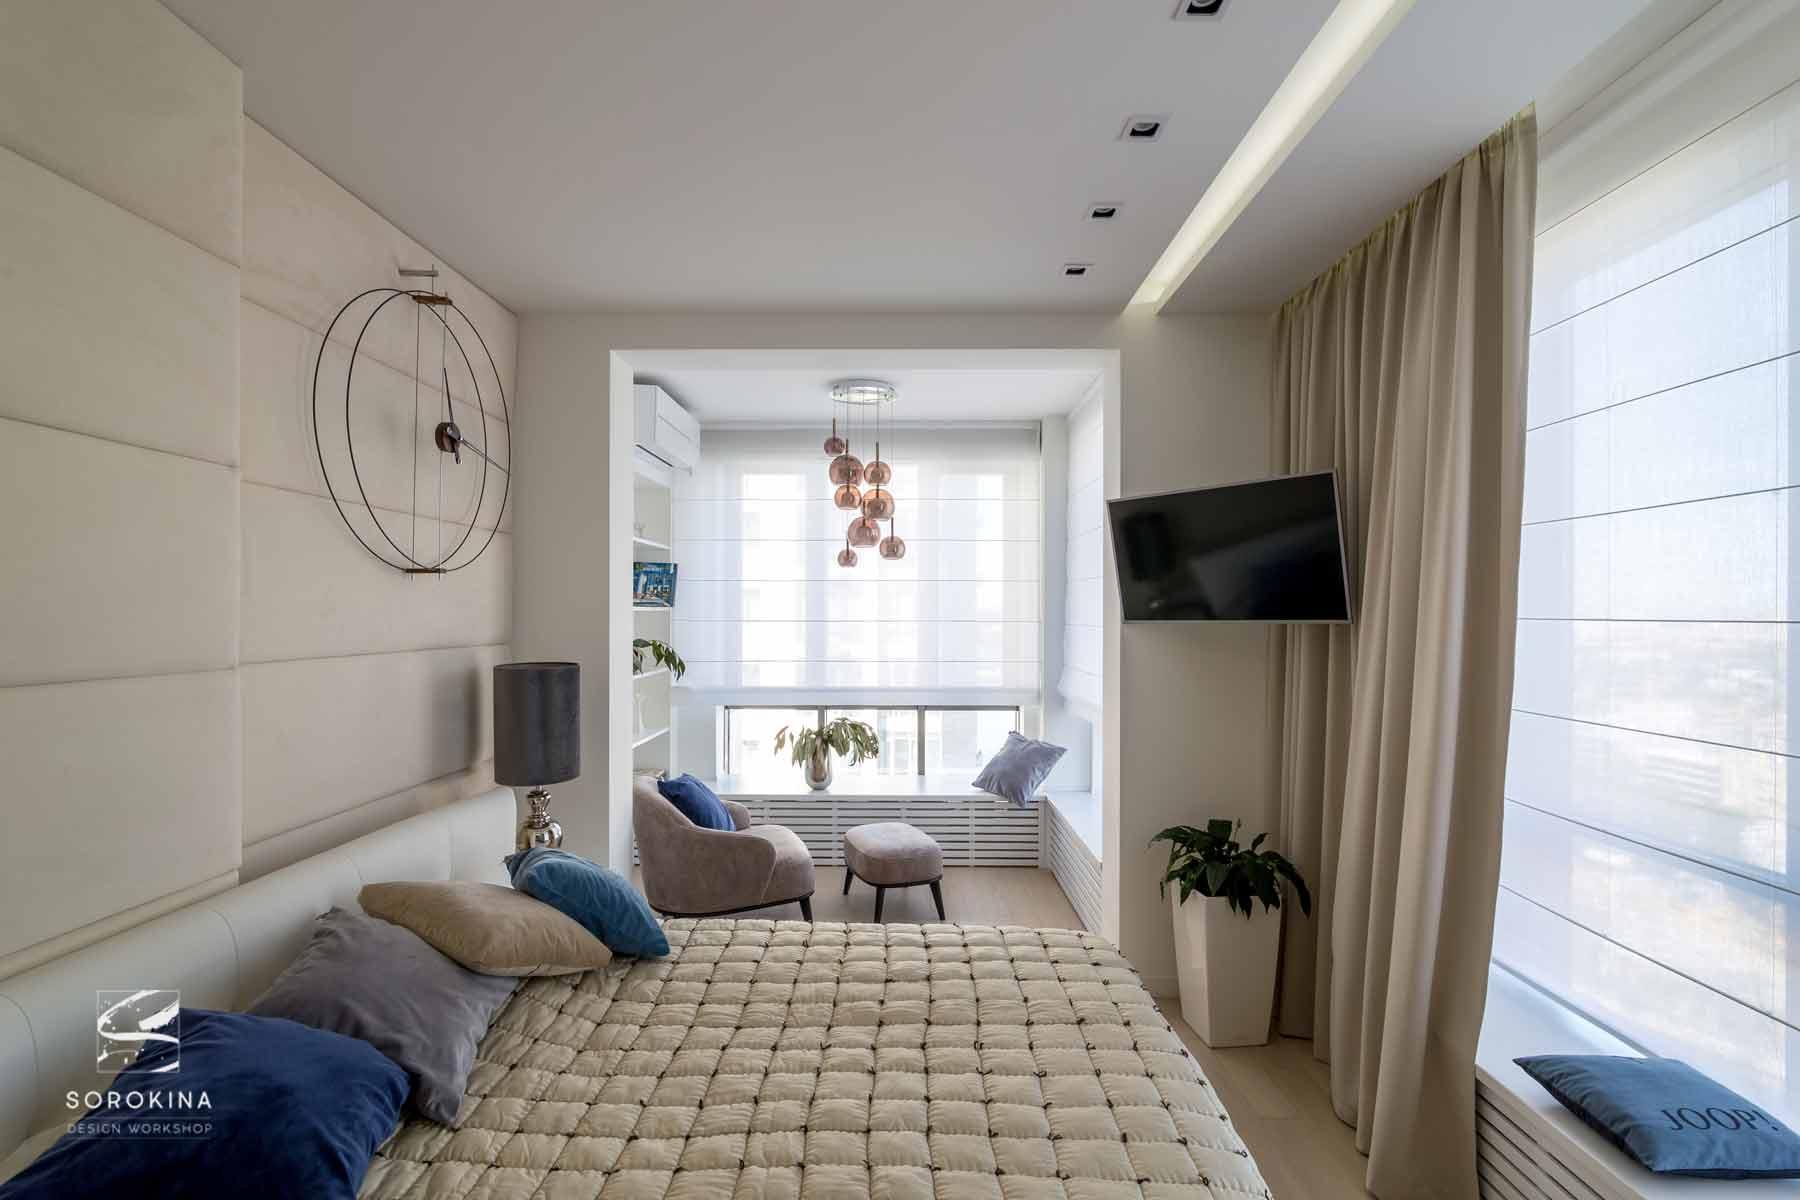 Дизайн-интерьера-спальни-1-Moonstone-ЖК-Ривер-стоун